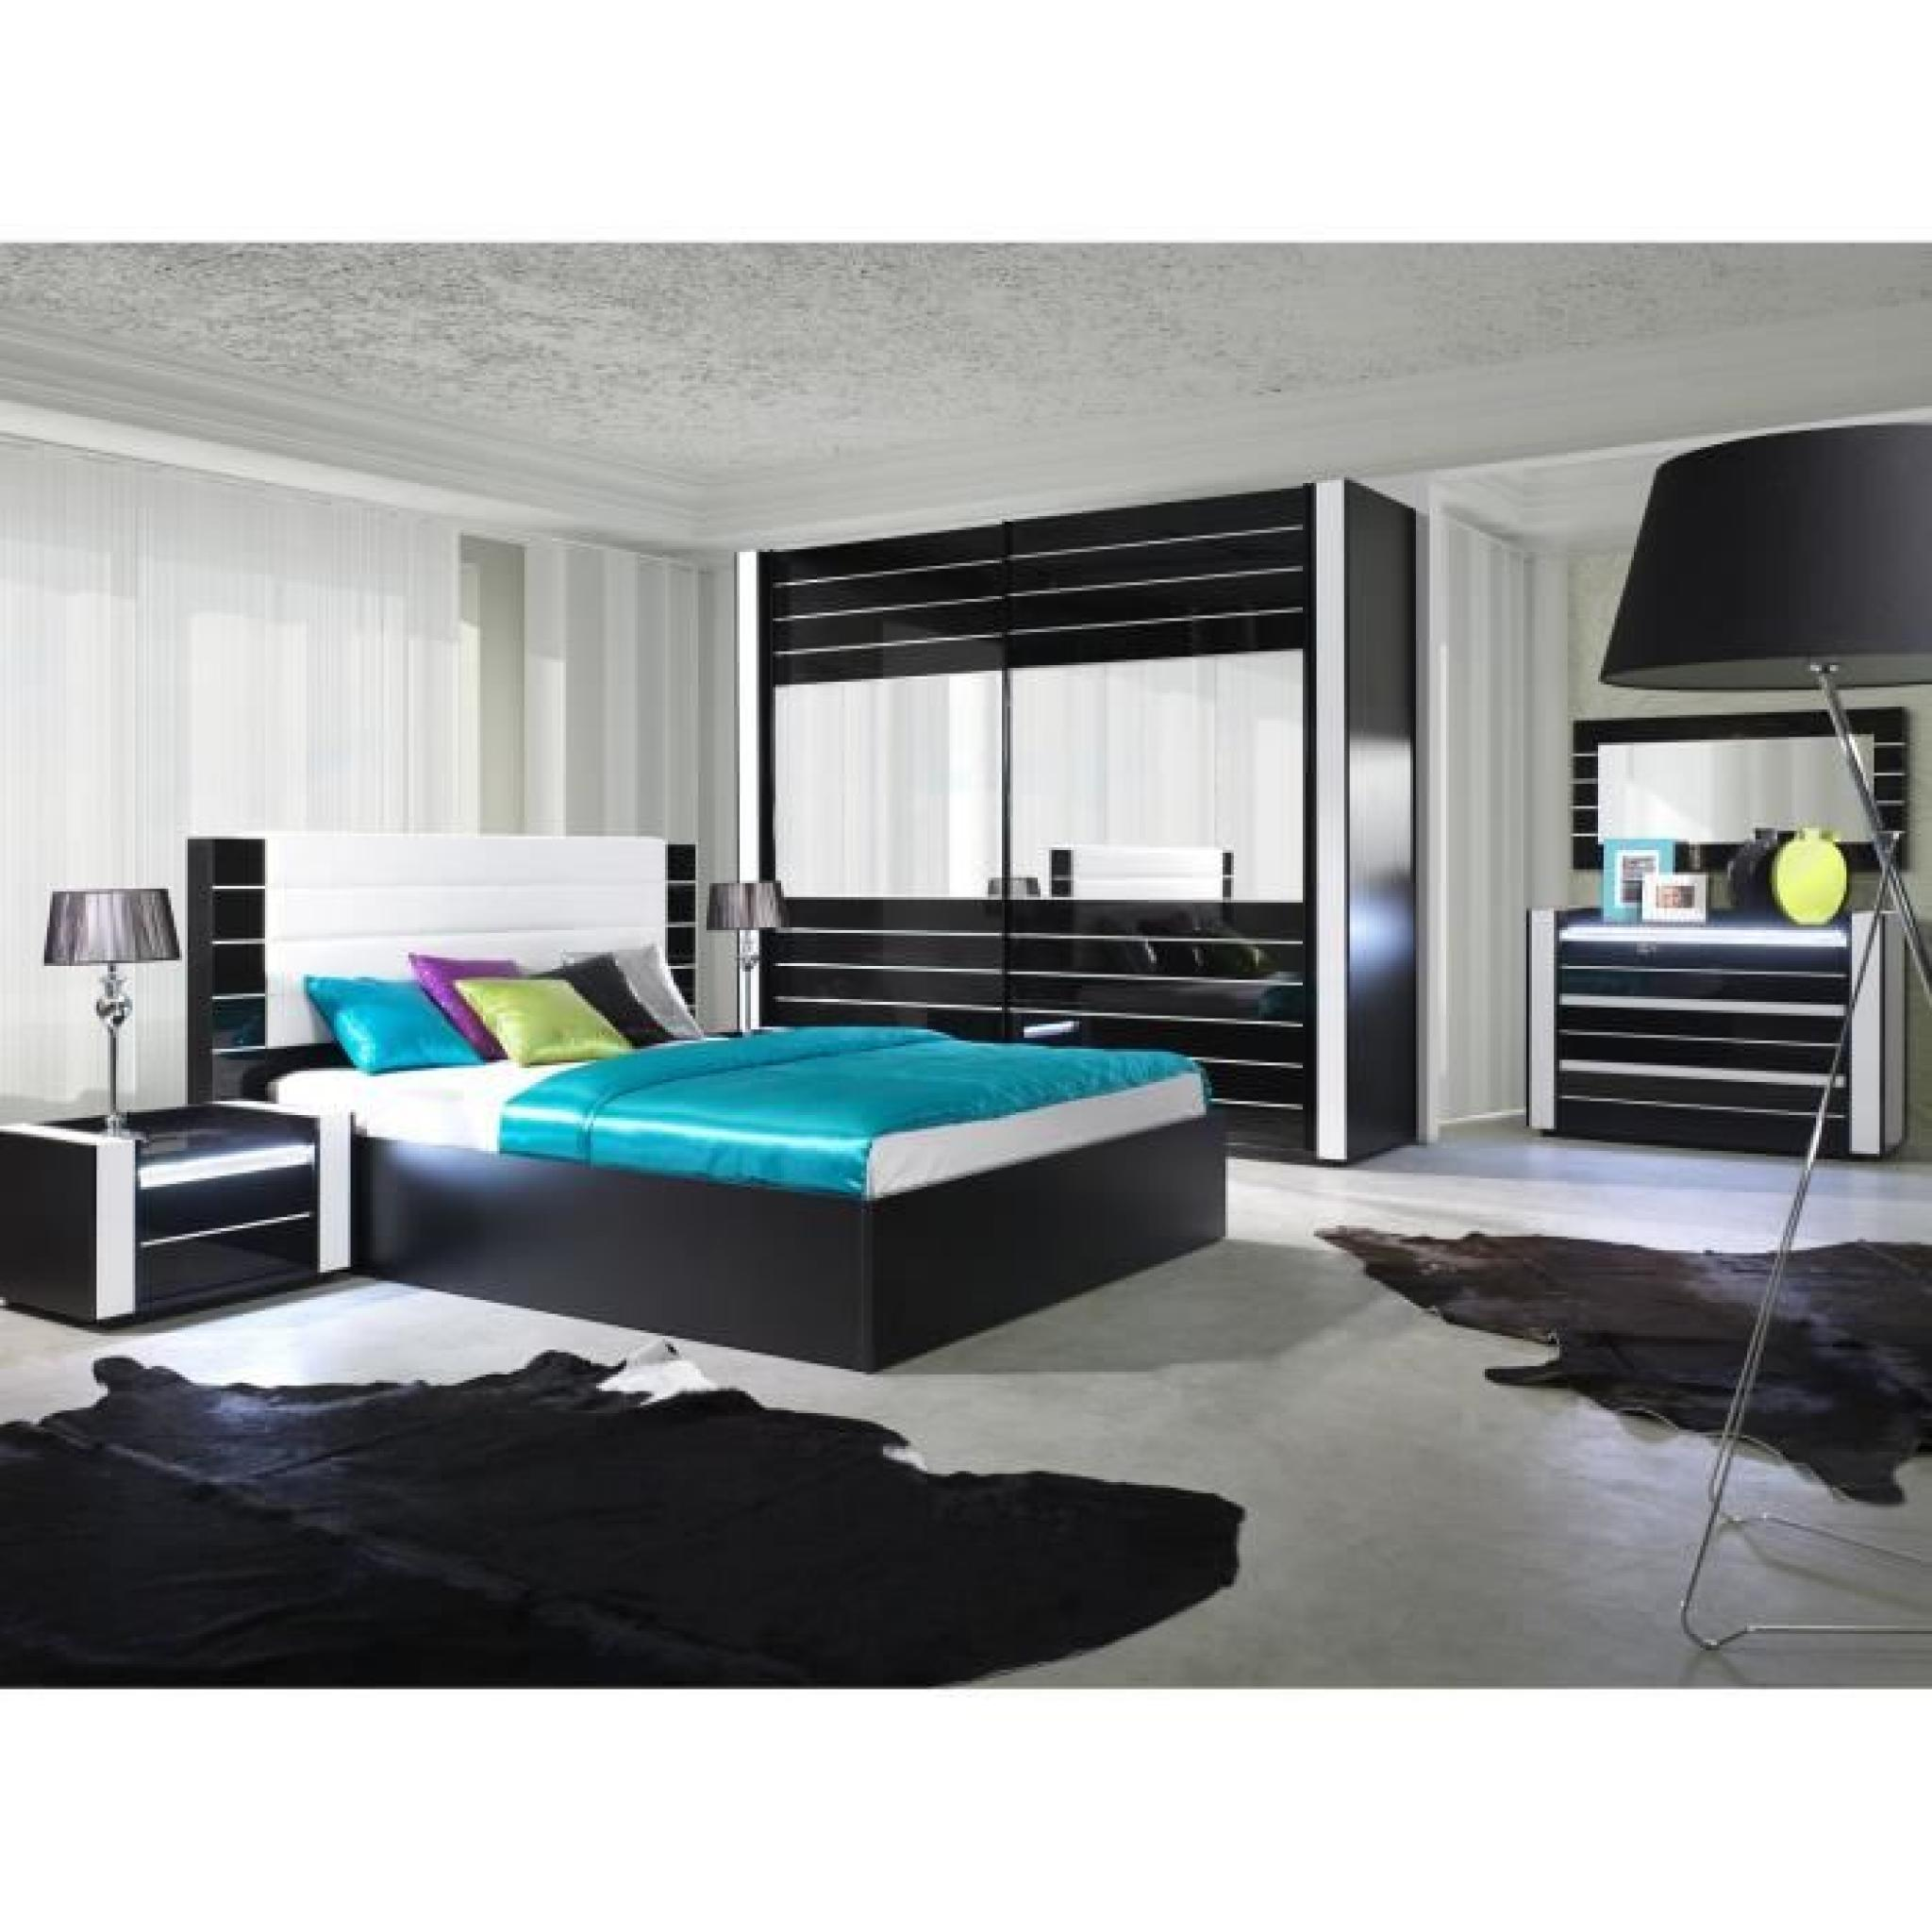 Armoire lina noir et blanche laqu e tout quip e meuble for Meuble pour veranda pas cher